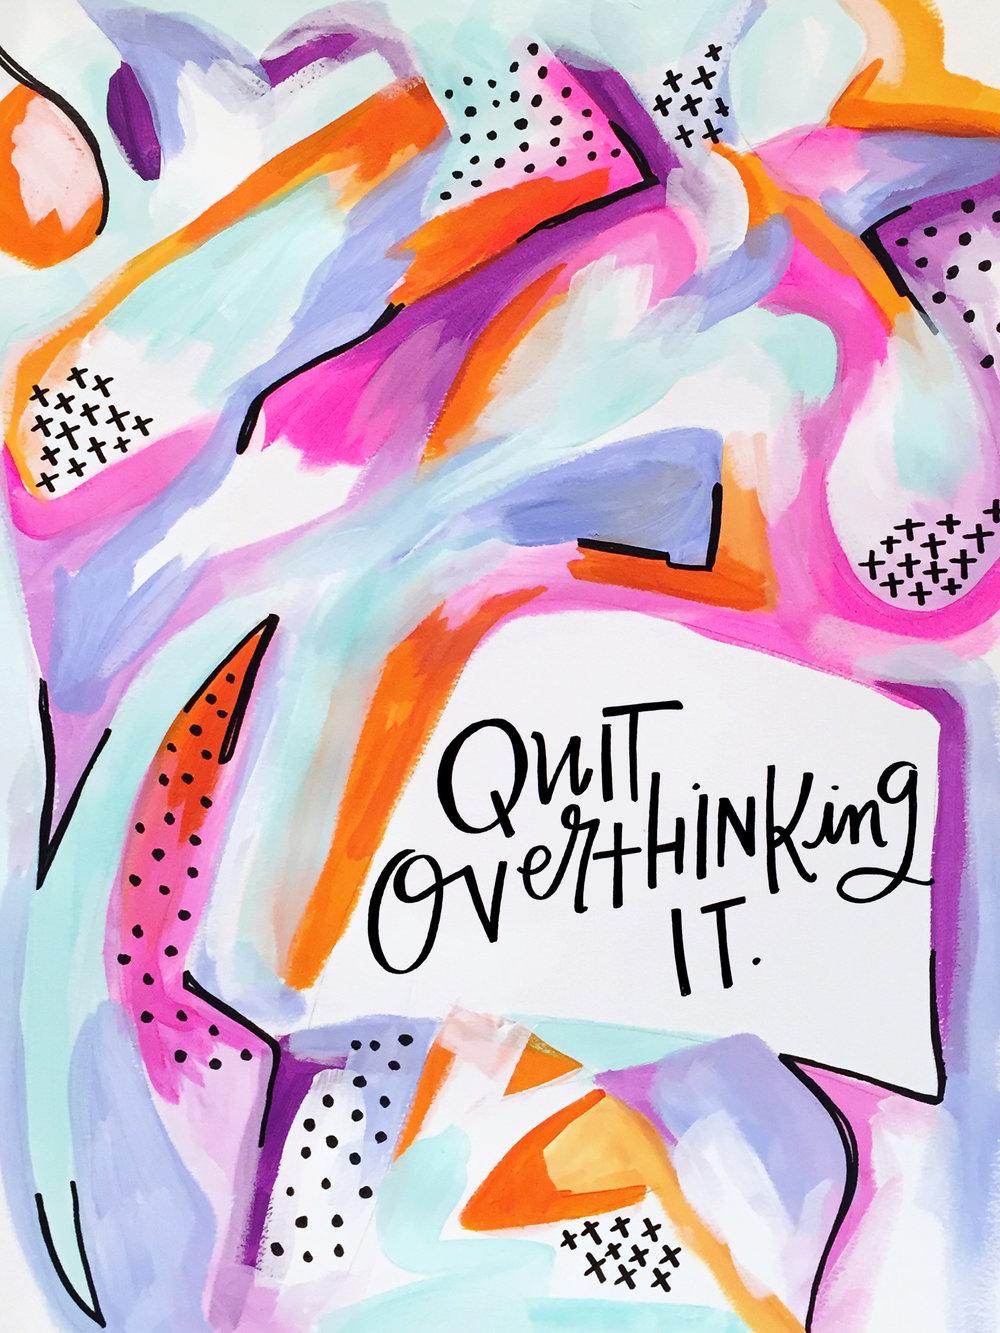 1/27/16: Overthink